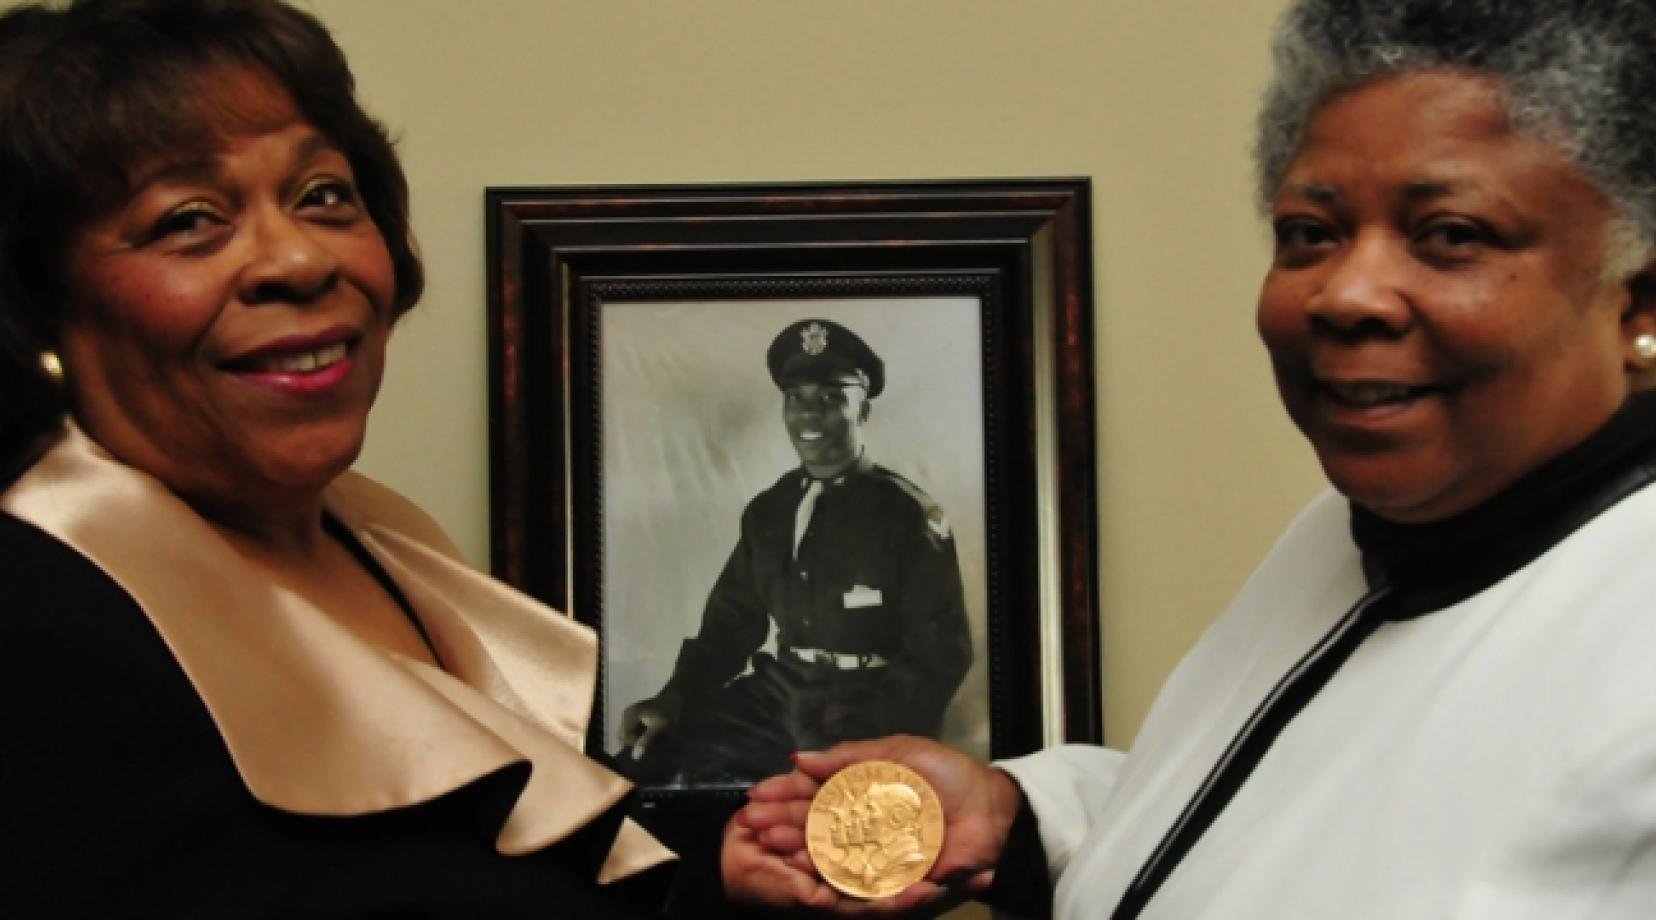 DSU, Dr. Luna I. Mishoe, Tuskegee Airmen